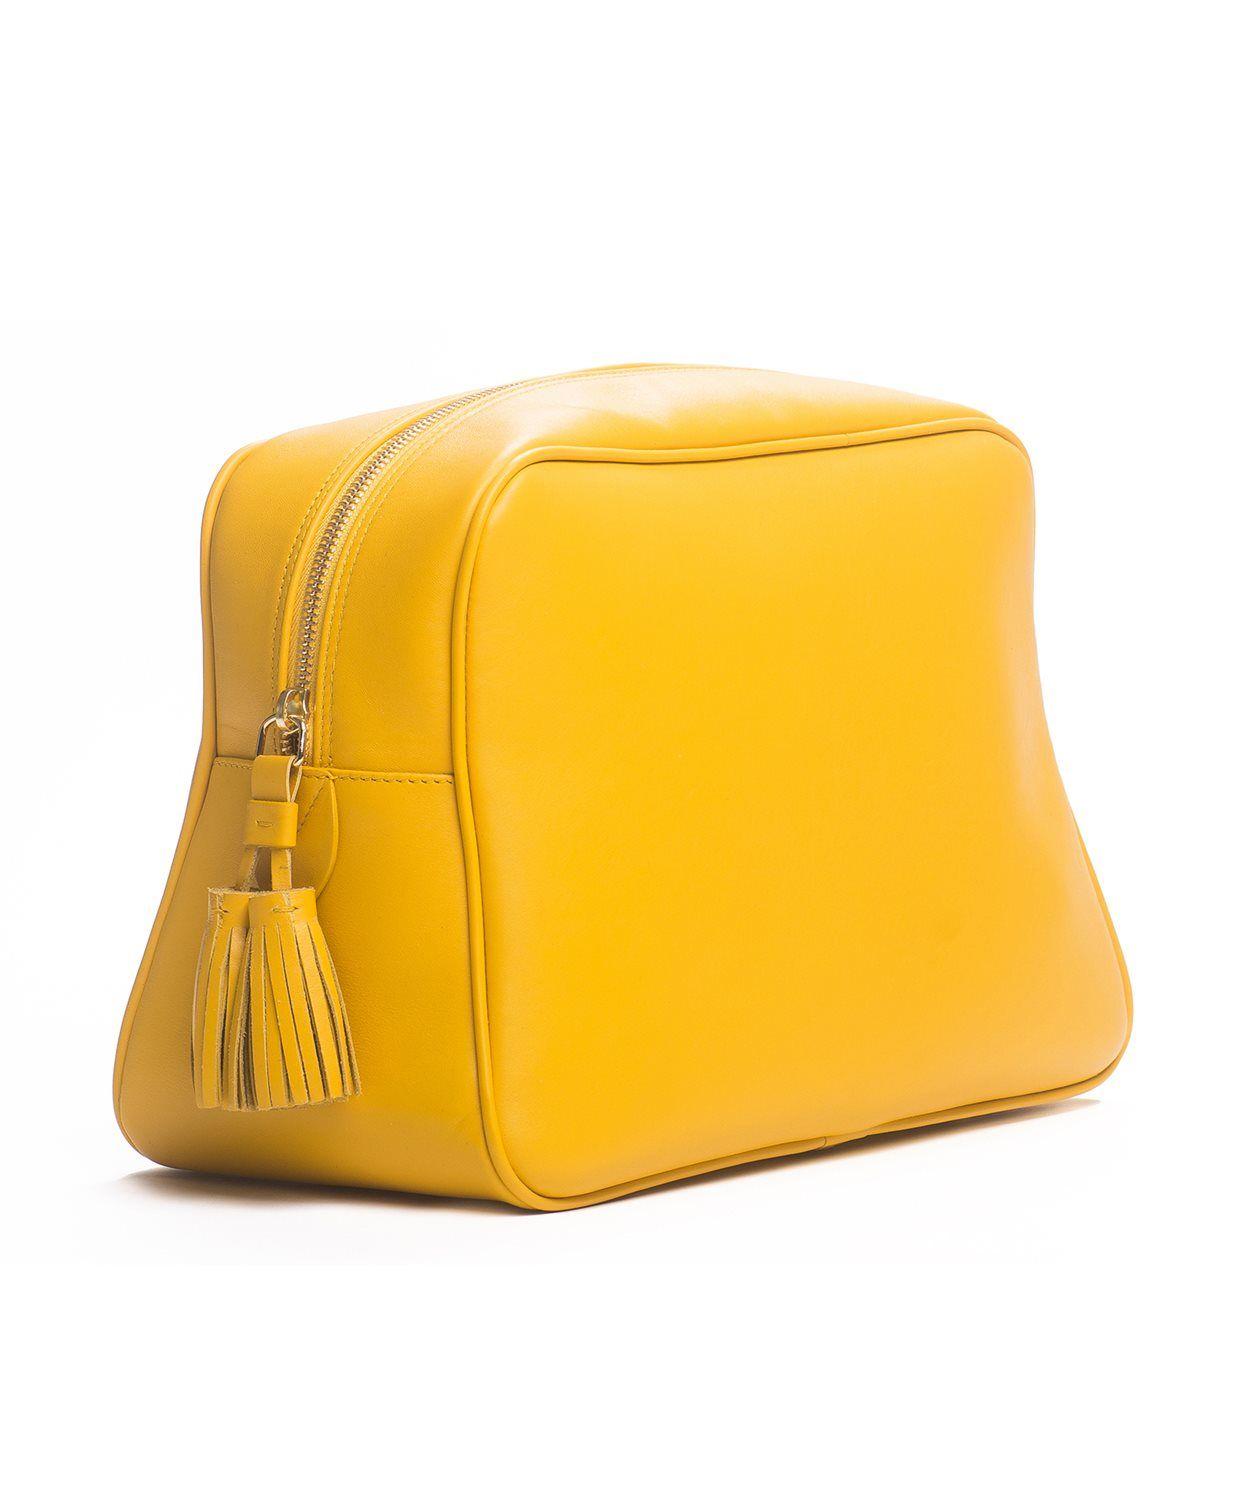 Palmgrens - Necessär Gul - Genuine handcrafted leather since 1896 ... d99c5967ec929